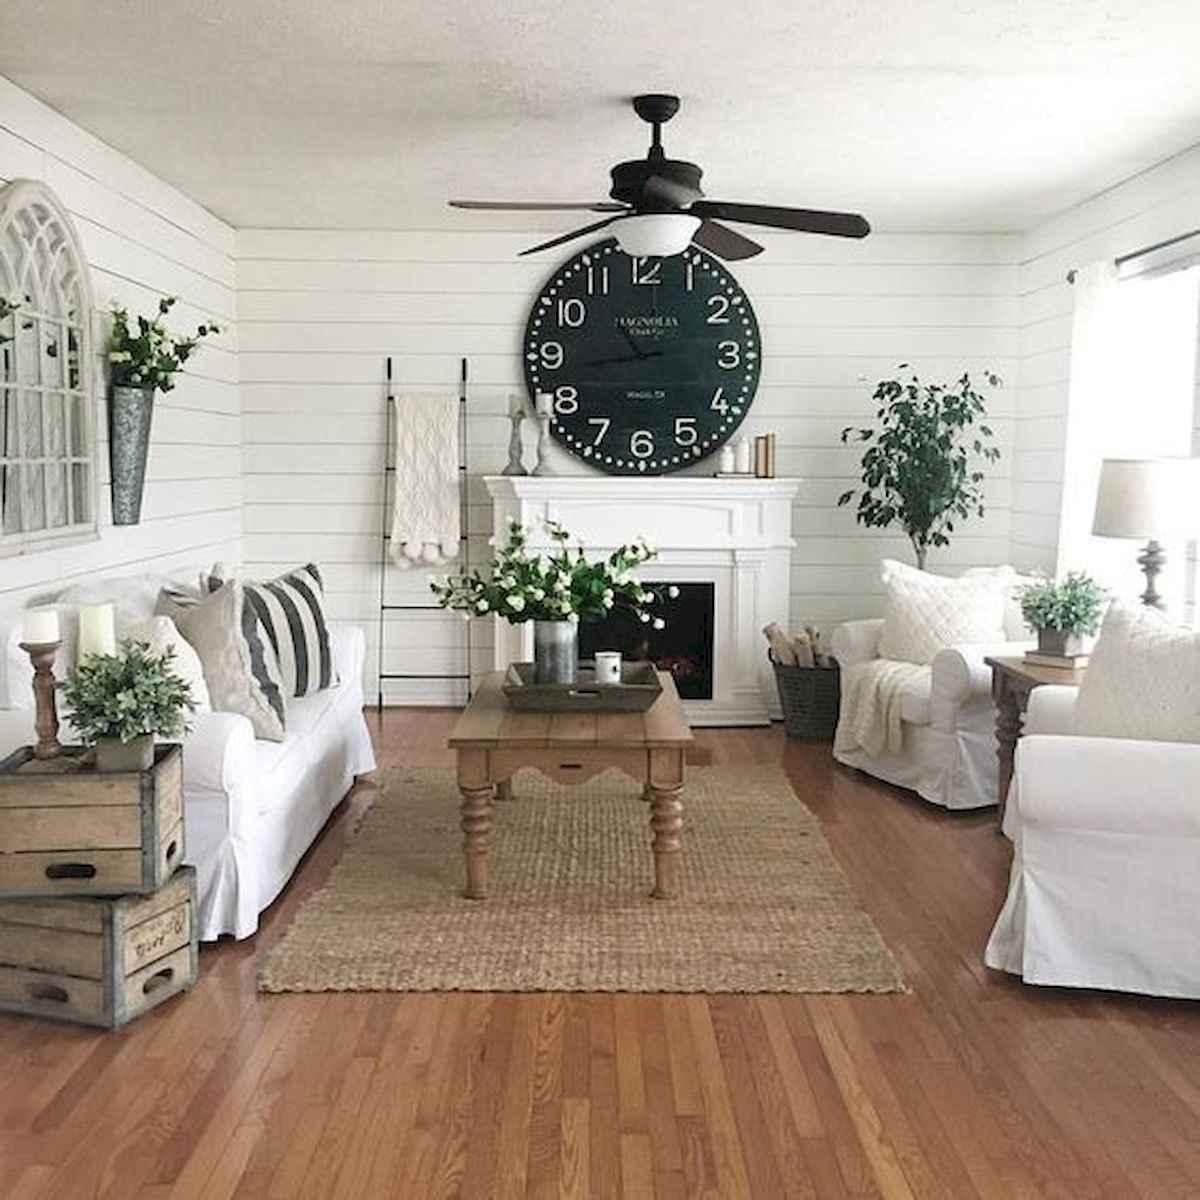 30 Modern Home Decor Ideas: 30 Elegant Farmhouse Living Room Decor Ideas (15